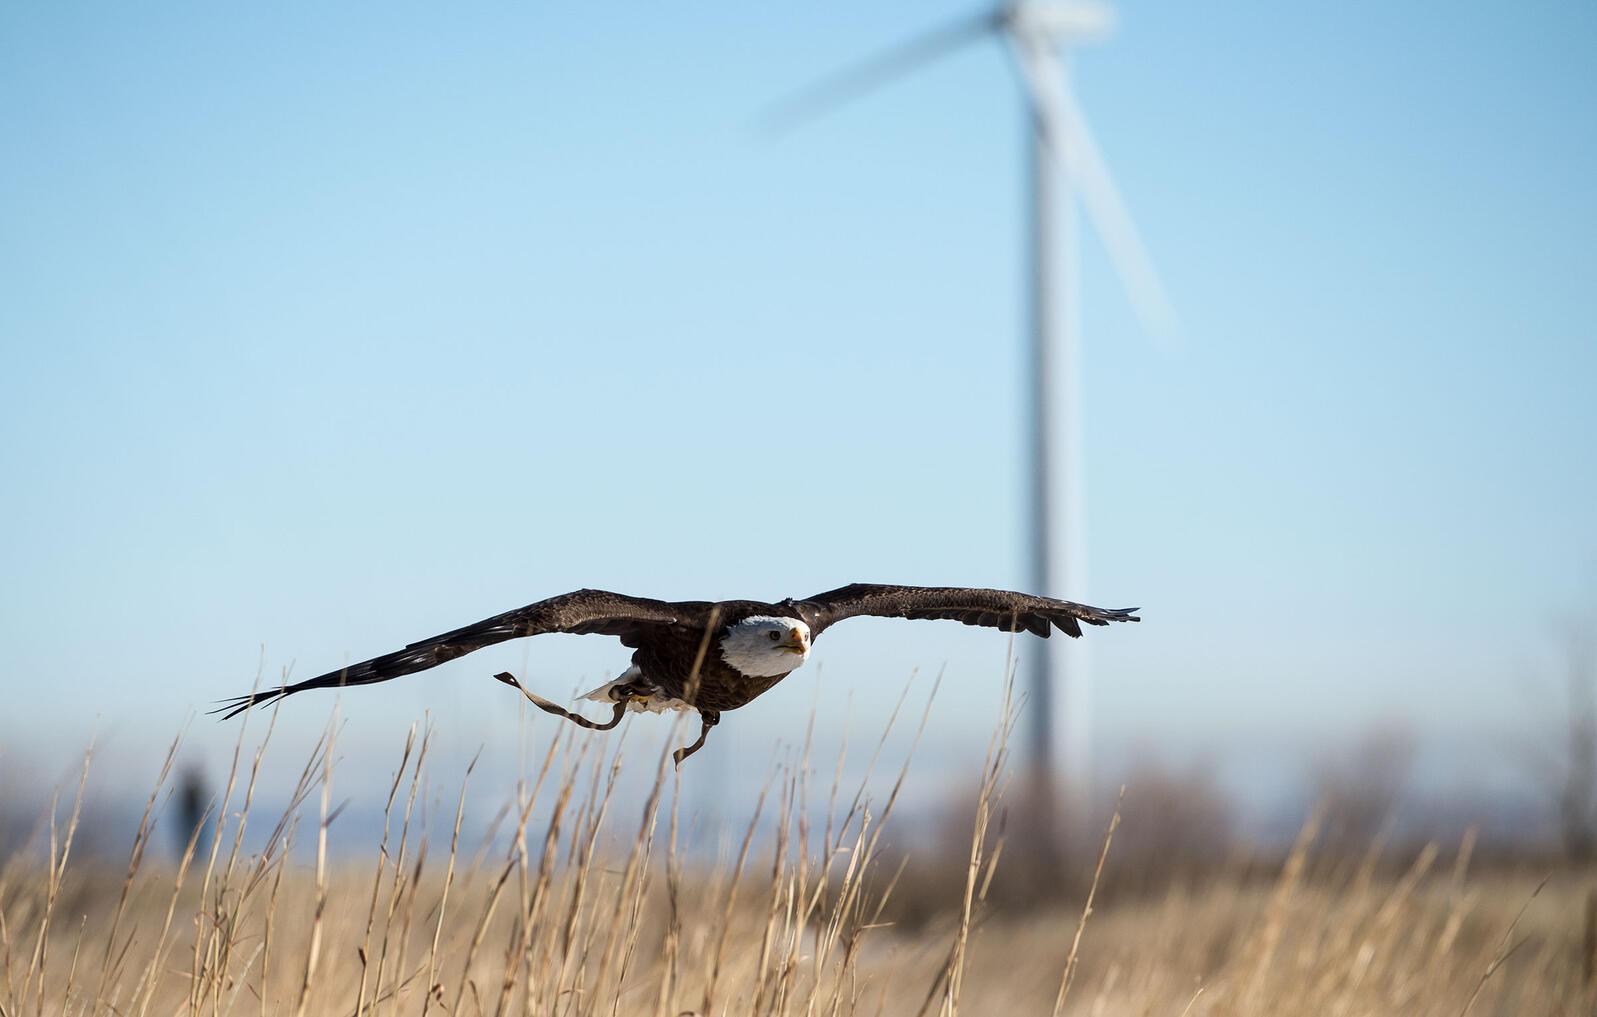 "Spirit, a 20-year-old Bald Eagle at the National Wind Technology Center in Boulder, Colorado. <a href=""https://www.flickr.com/photos/nrel/24332498813/in/album-72157664341321922/"">Dennis Schroeder/NREL</a>/Flickr CC (BY-NC-ND 2.0)"